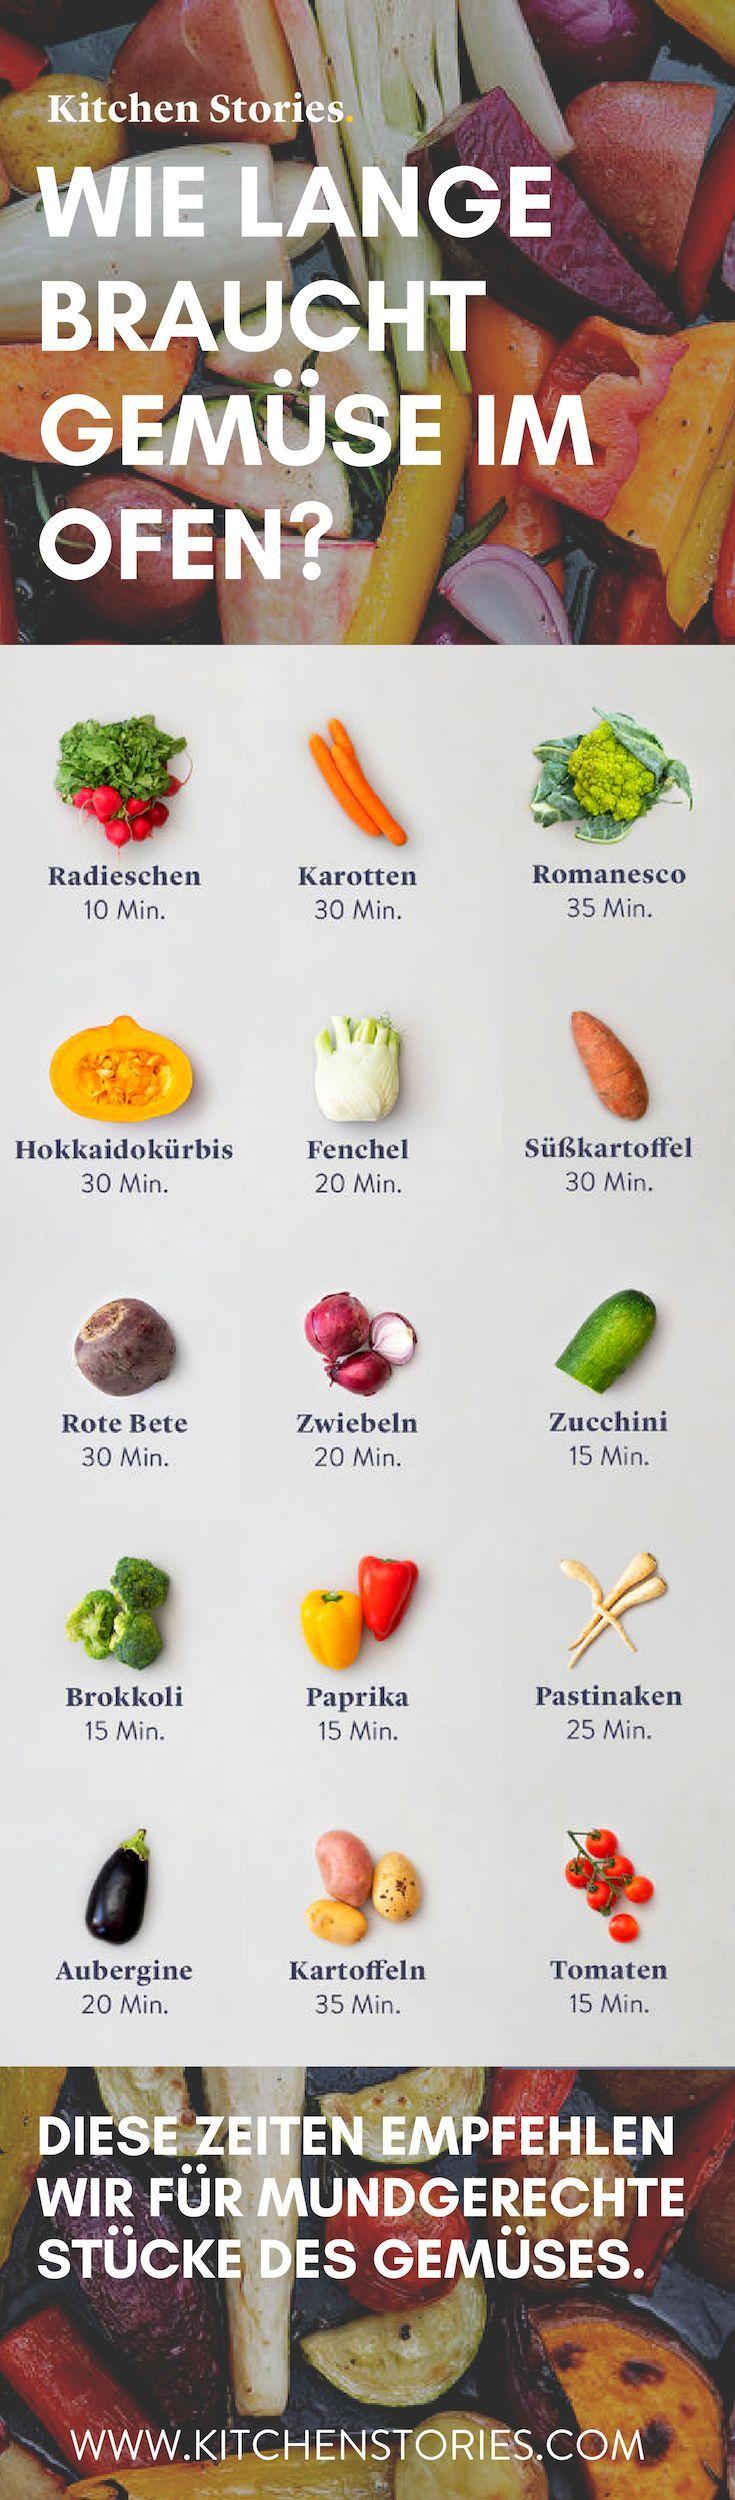 In 5 Schritten zum perfekten Ofengemüse